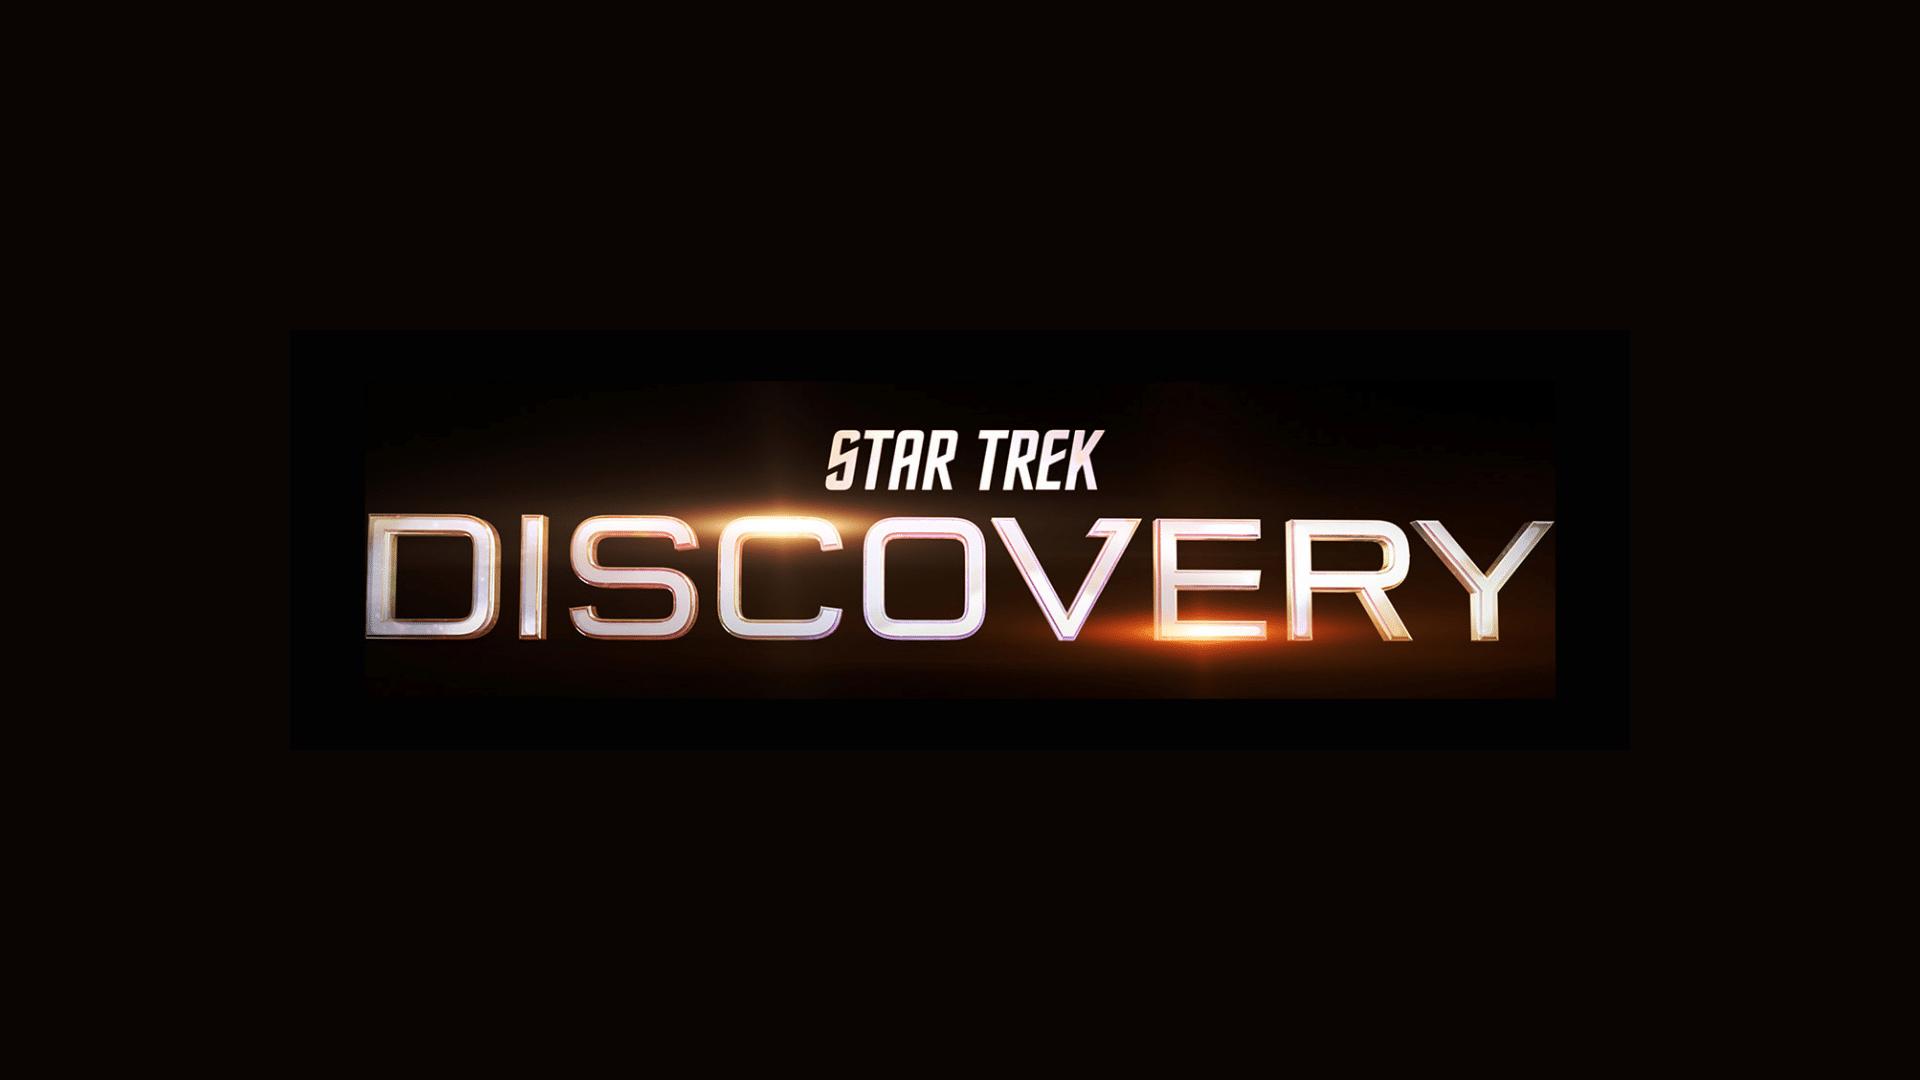 Star Trek Discovery Opening Scene